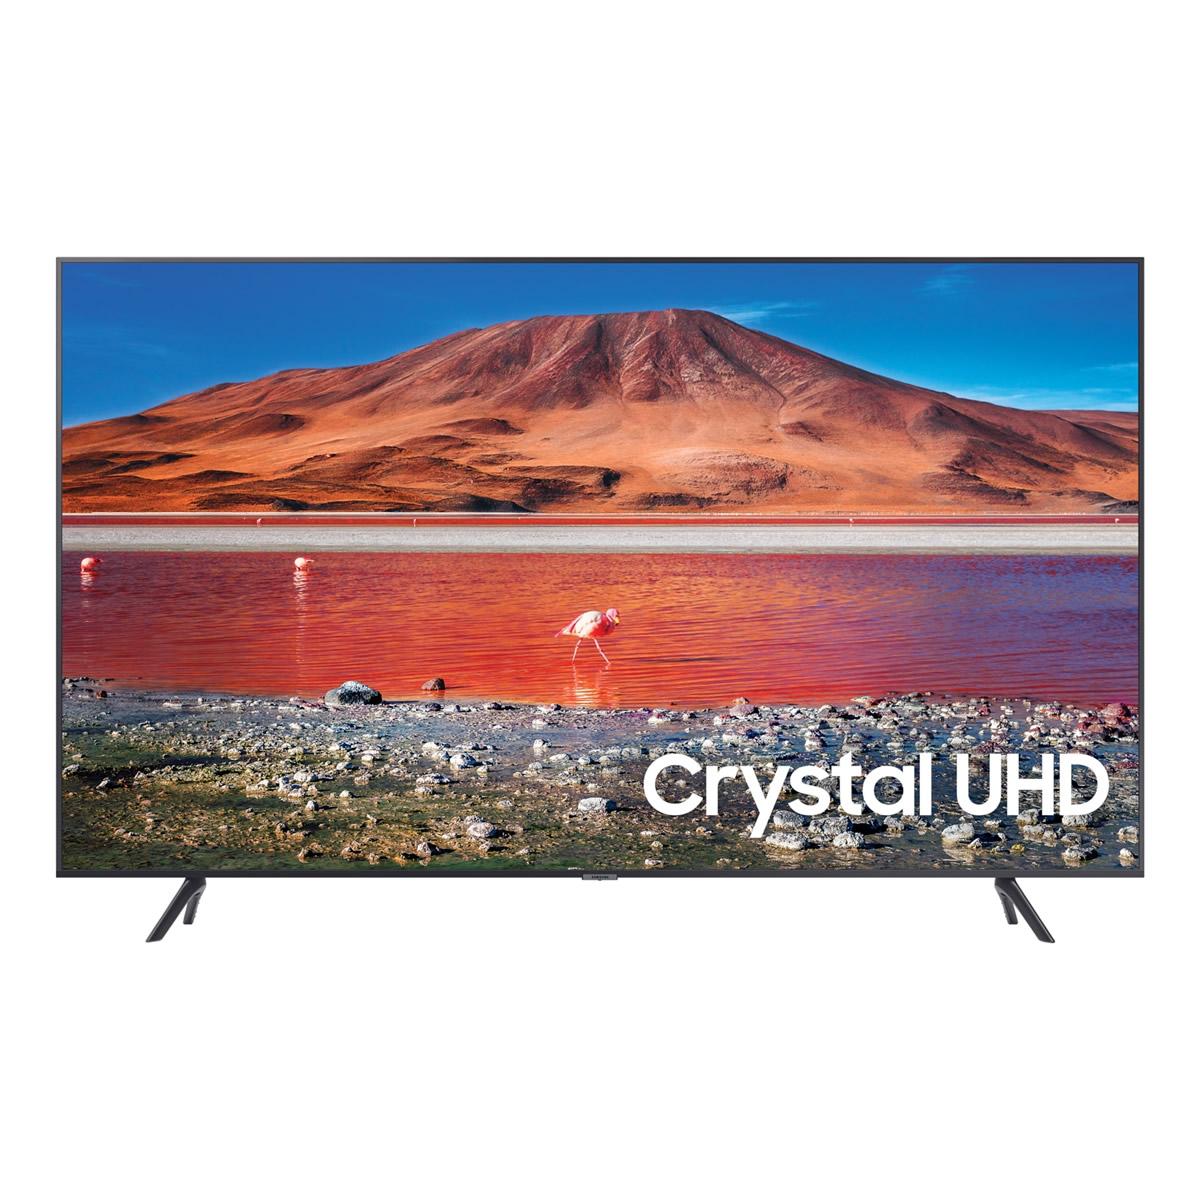 Samsung UE55TU7100 (2020) HDR 4K Ultra HD Smart TV, 55 inch with TVPlus, Silver